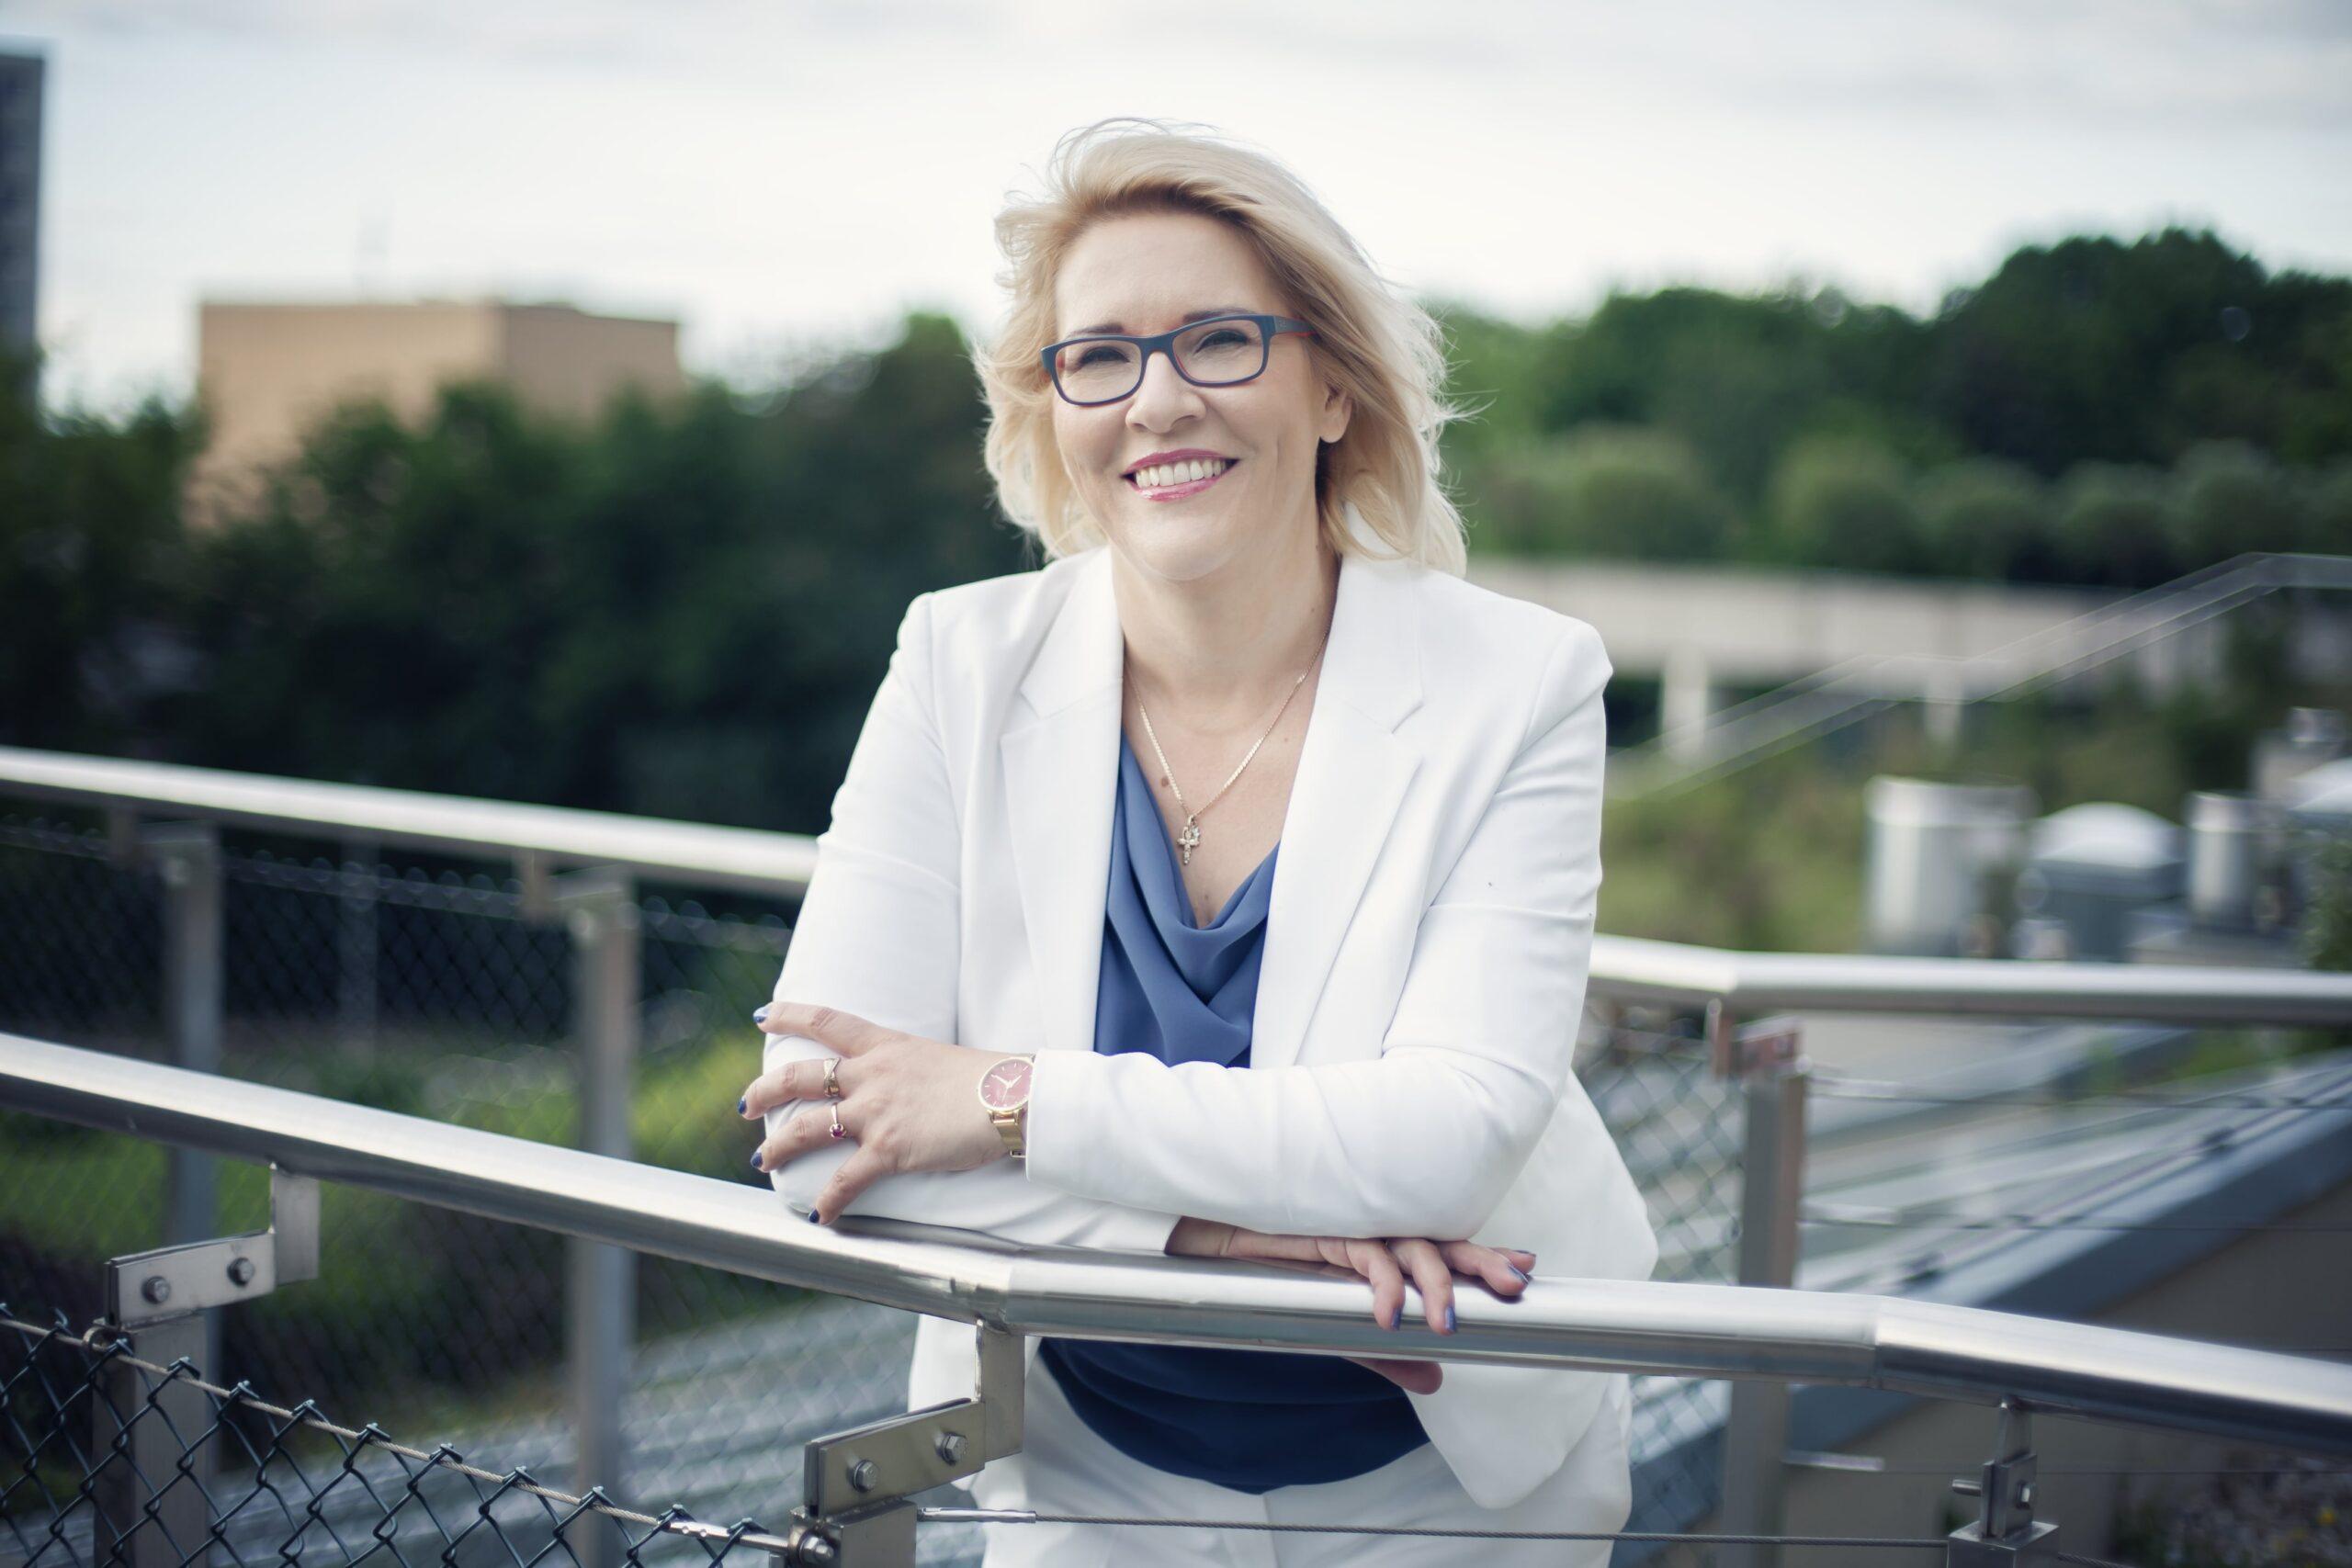 Ewa Szpakowicz - sesje coachingowe, mentoring, superwizje